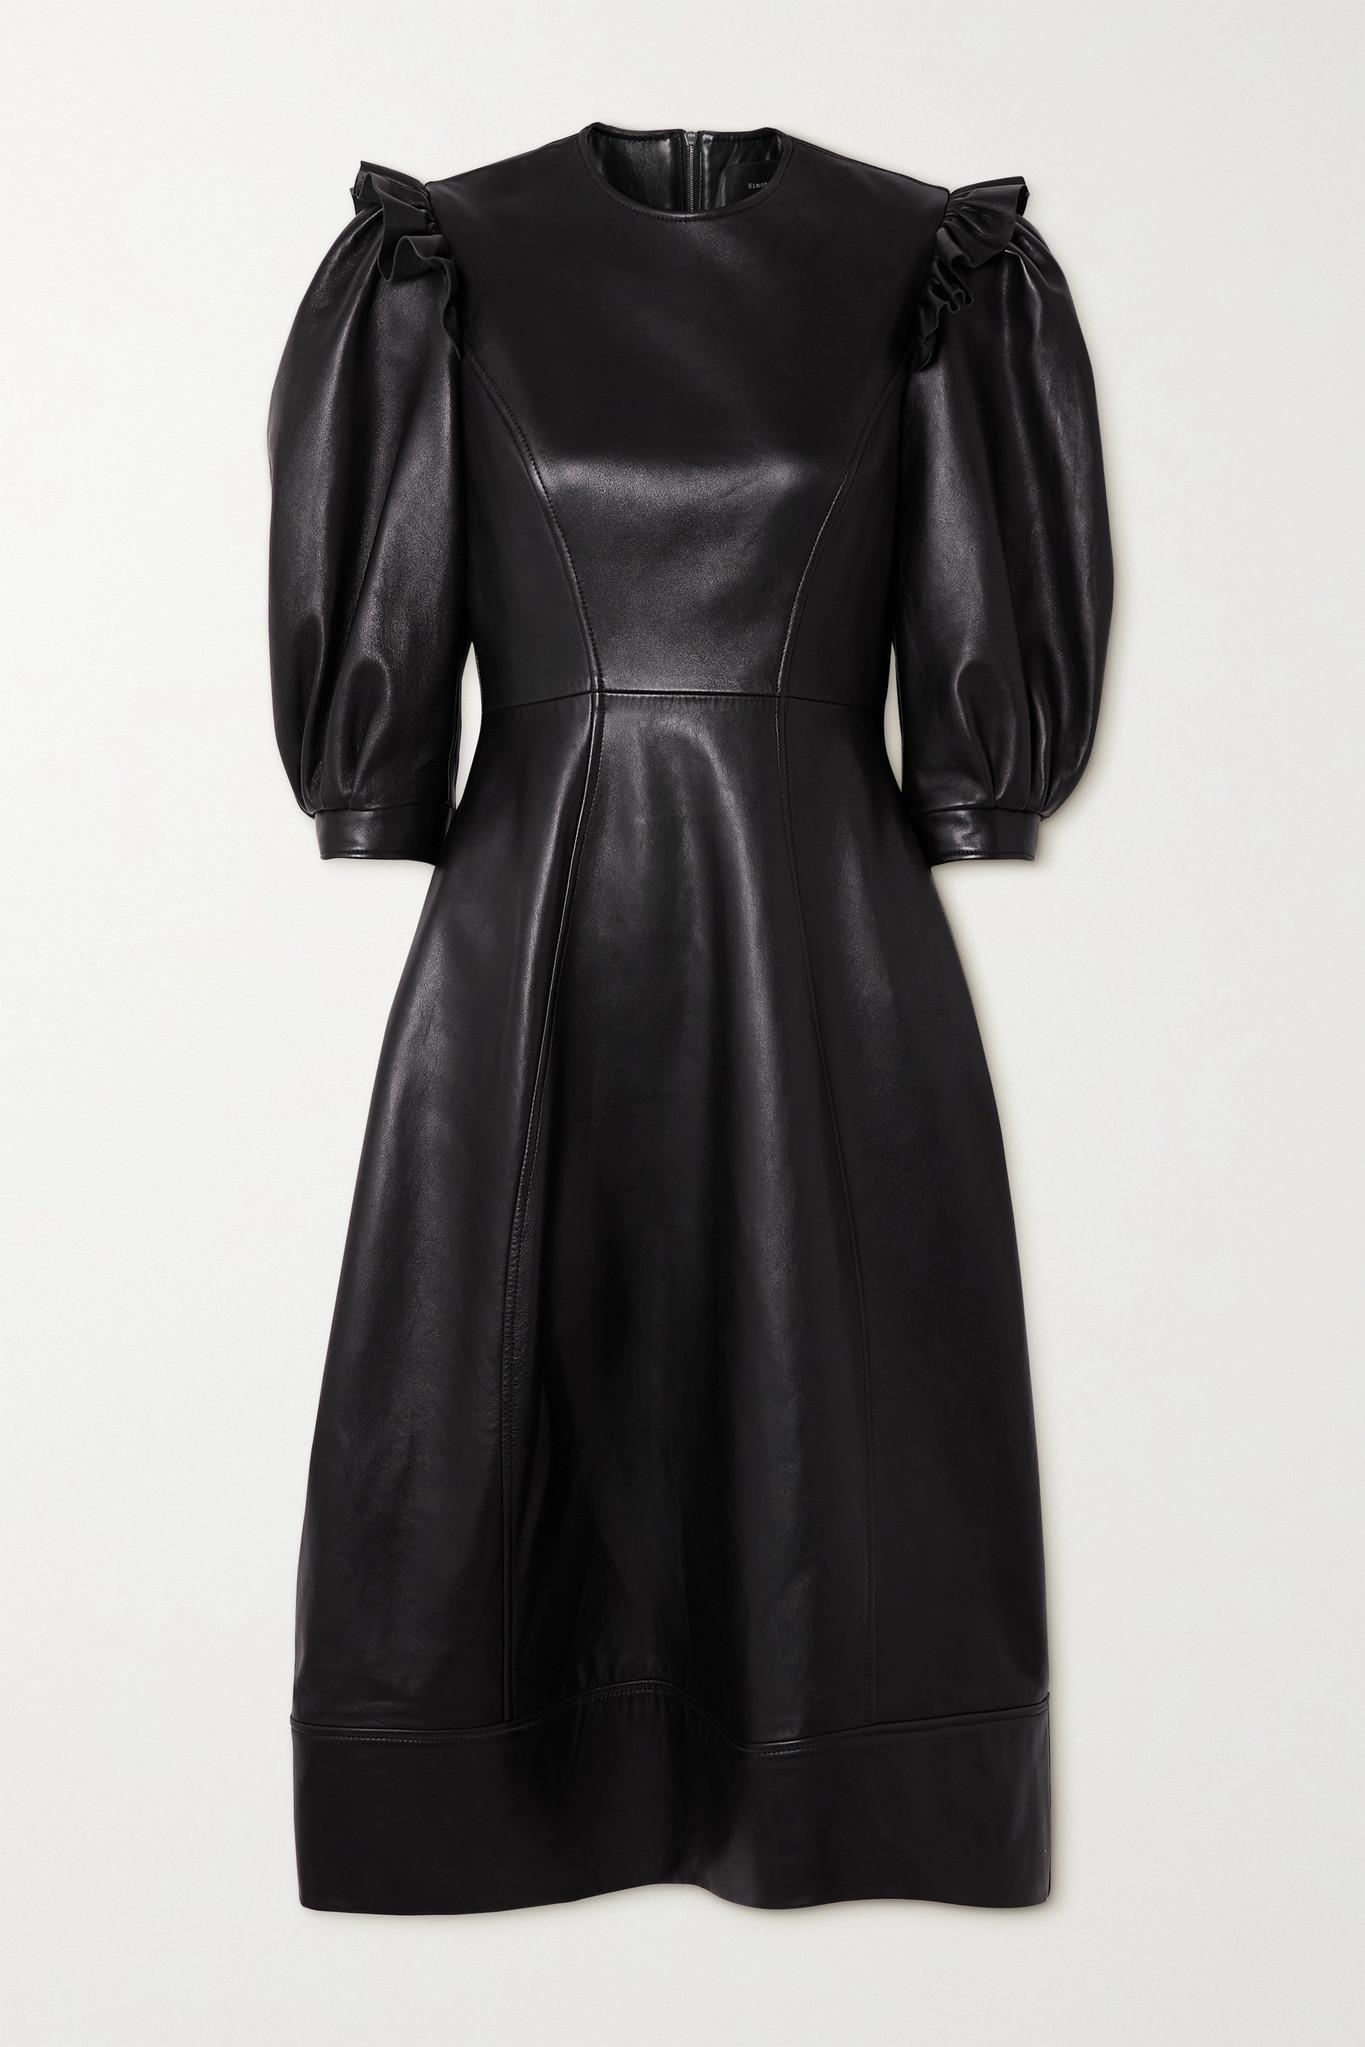 Simone Rocha - Ruffled Leather Midi Dress - Black - UK6